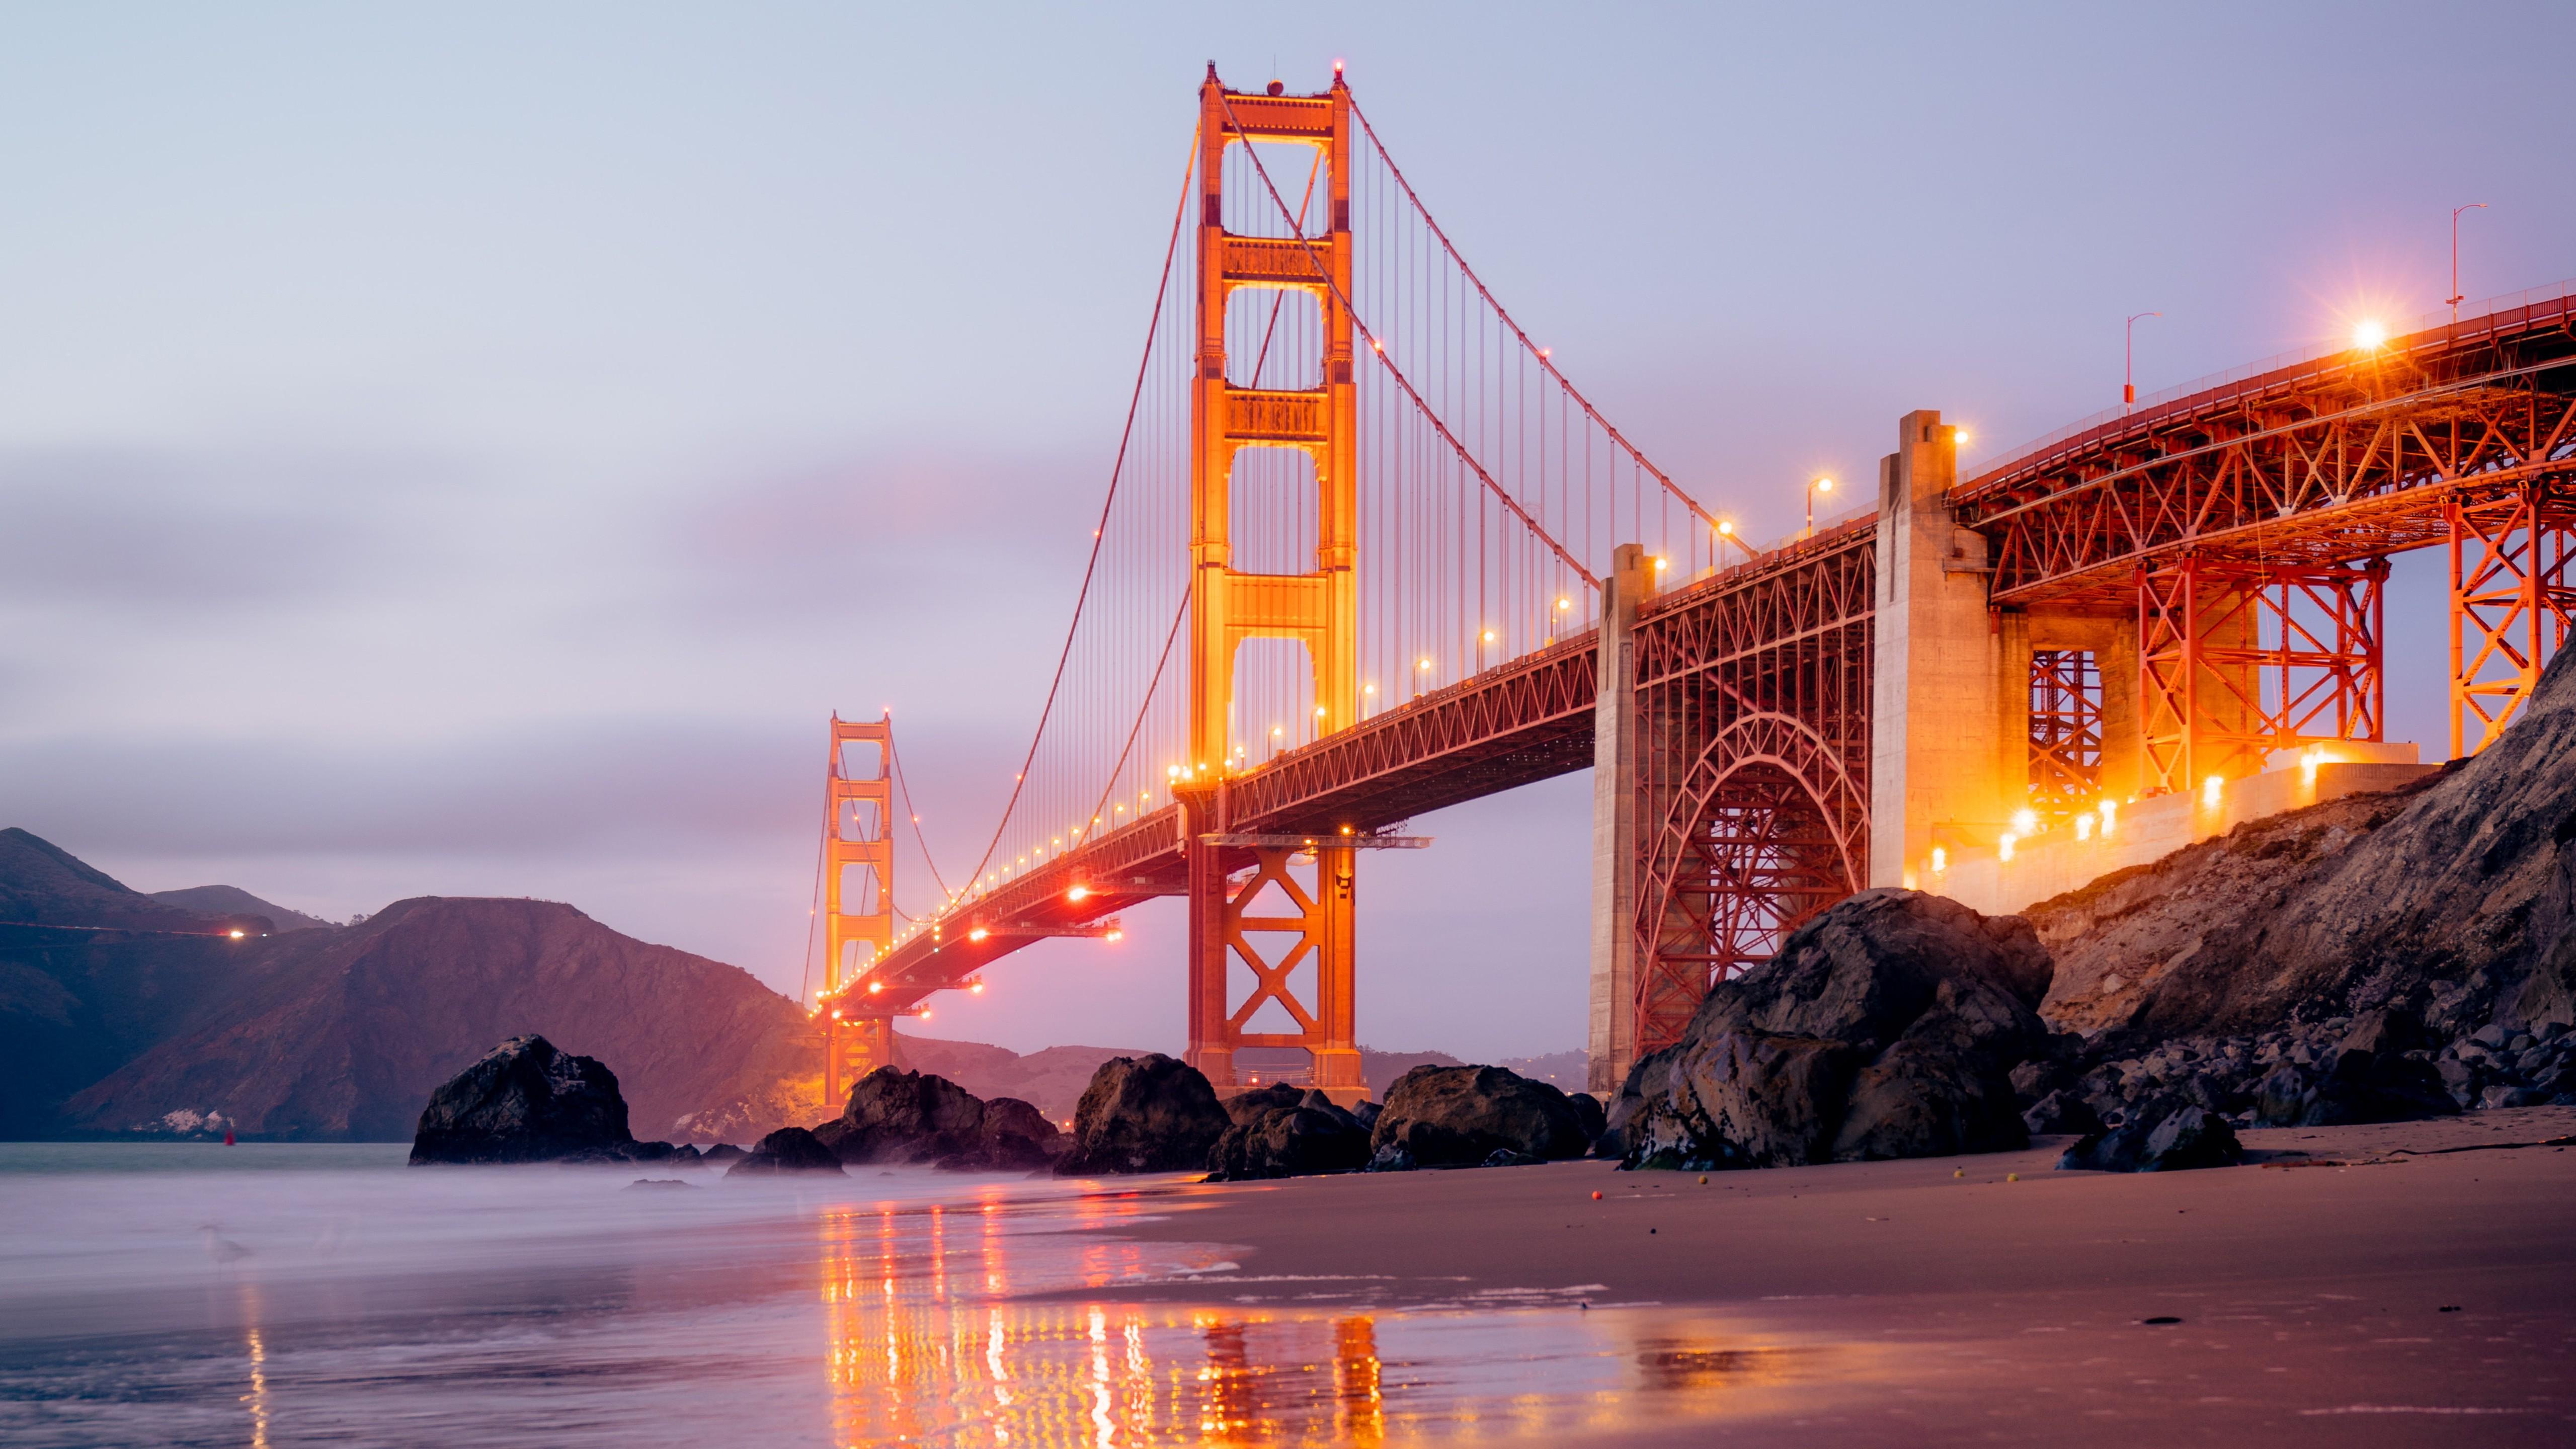 Wallpaper Golden Gate Bridge Usa San Francisco 5120x2880 Mikuu 1717041 Hd Wallpapers Wallhere